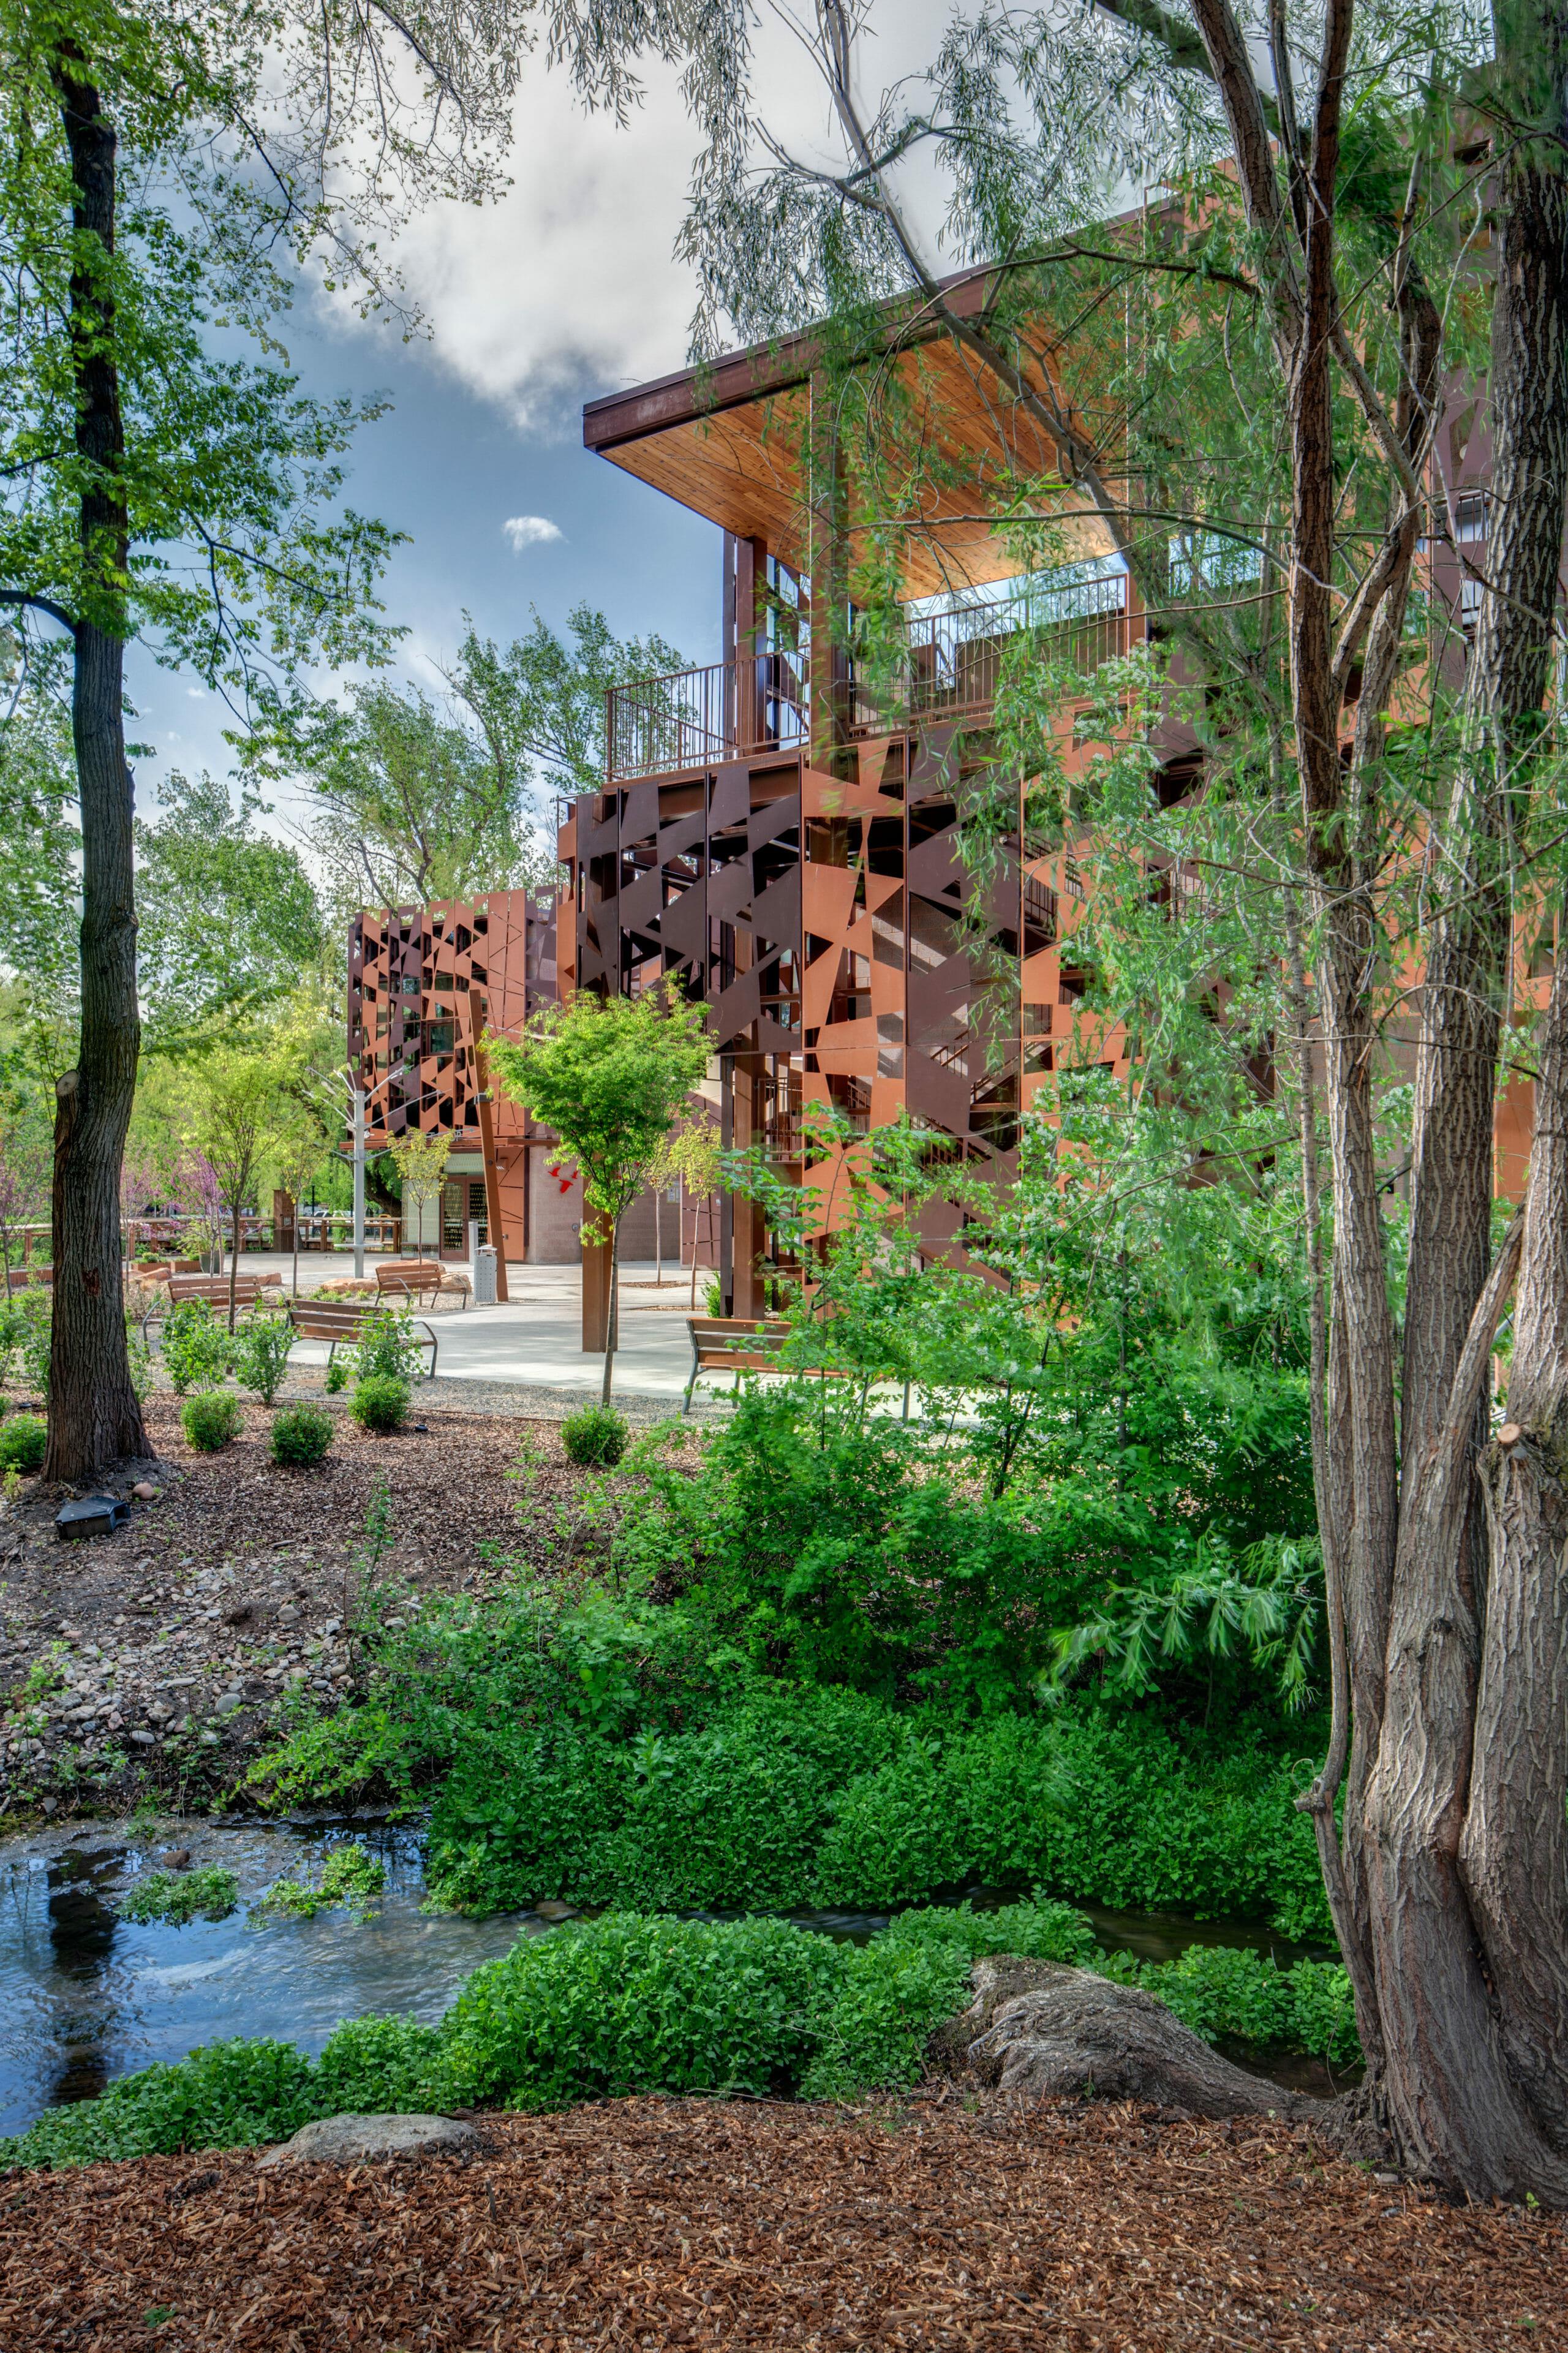 tracy aviary visitors center ajc architects